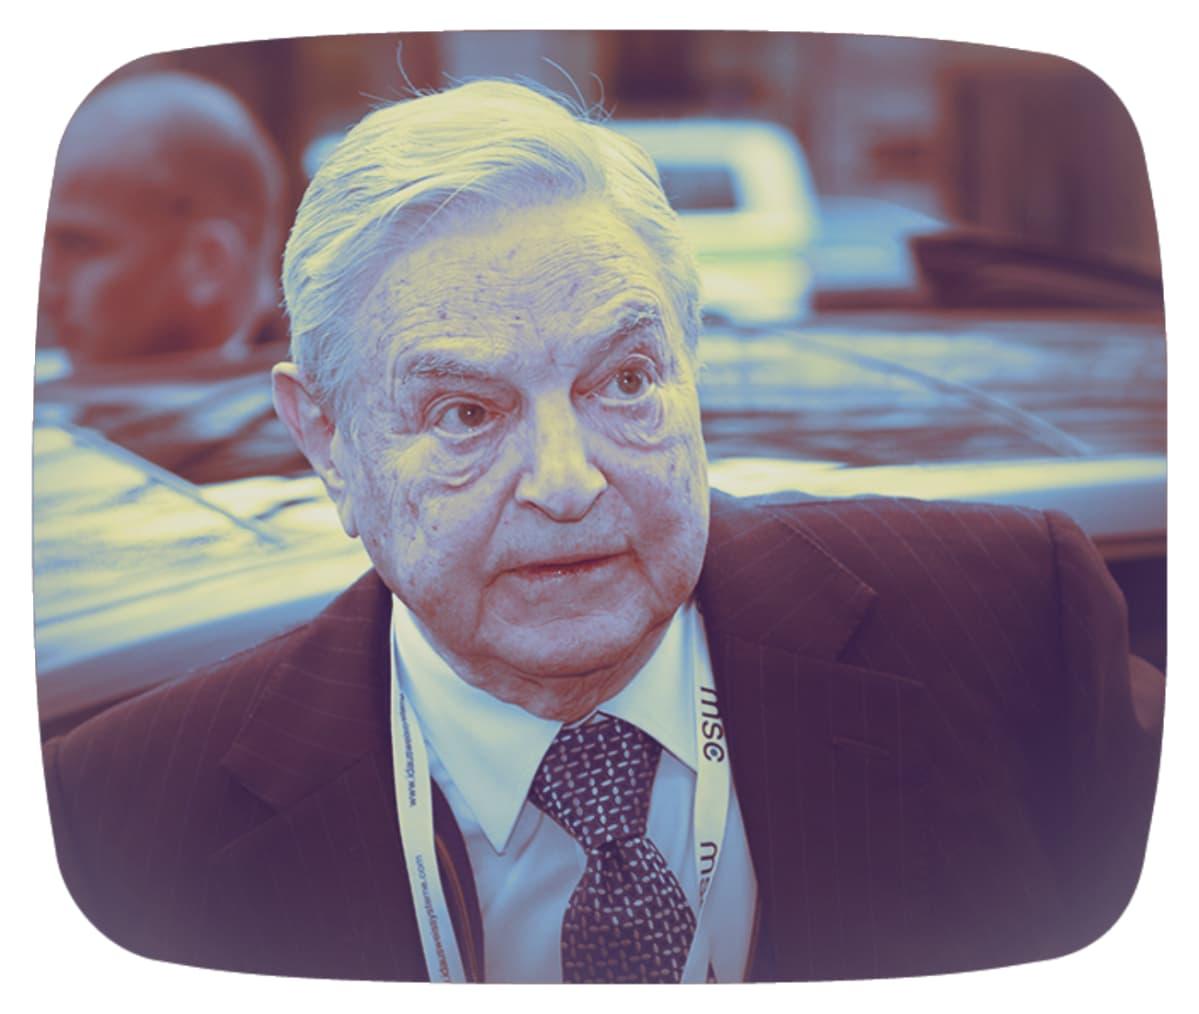 Käsitelty kuva George Sorosista.